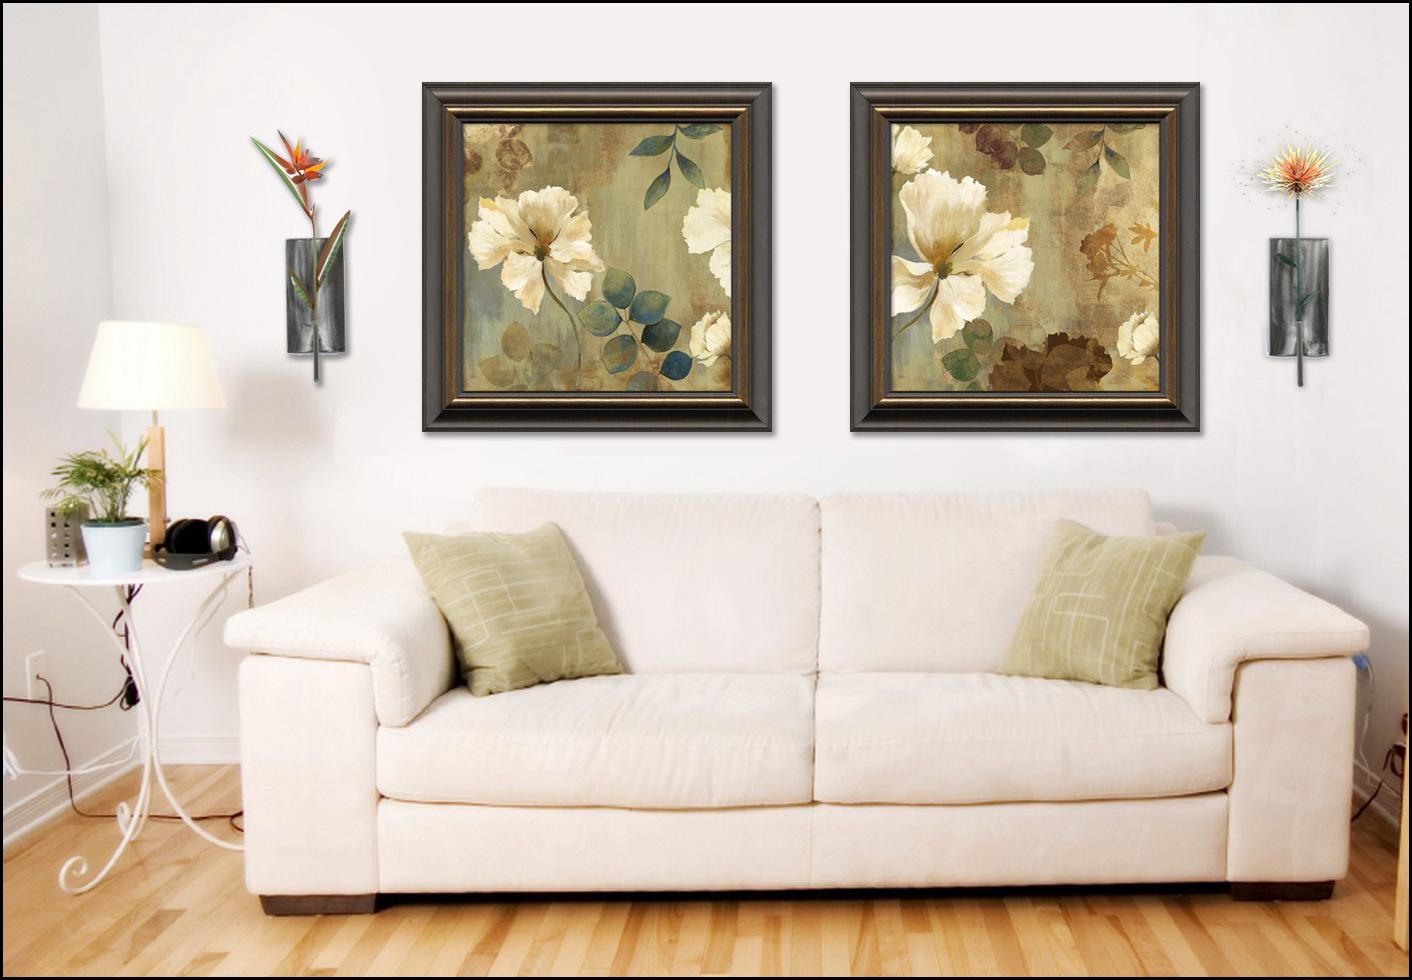 Outstanding Large Framed Art Image - Framed Art Ideas - roadofriches.com